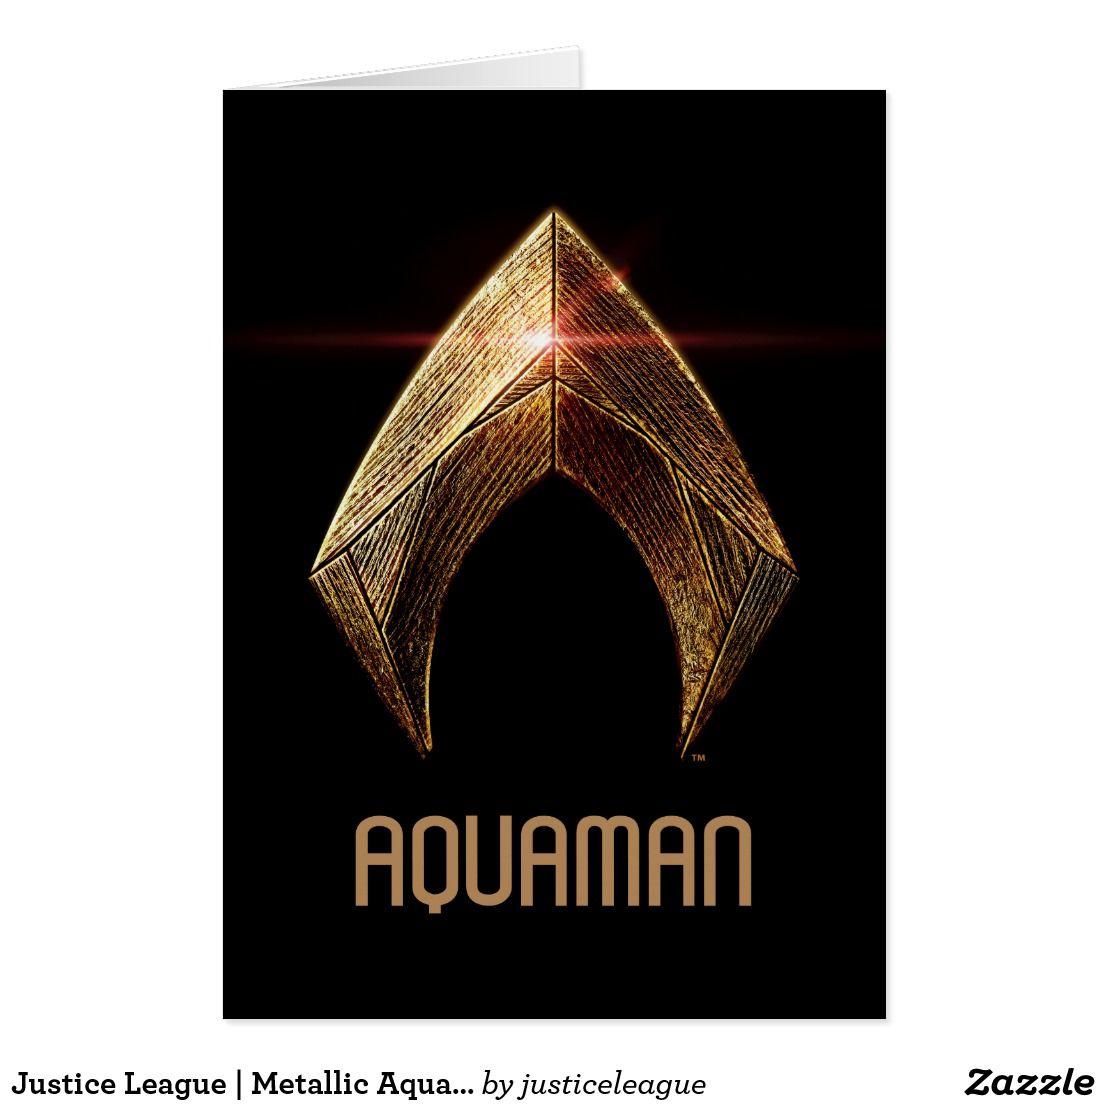 Justice league metallic aquaman symbol